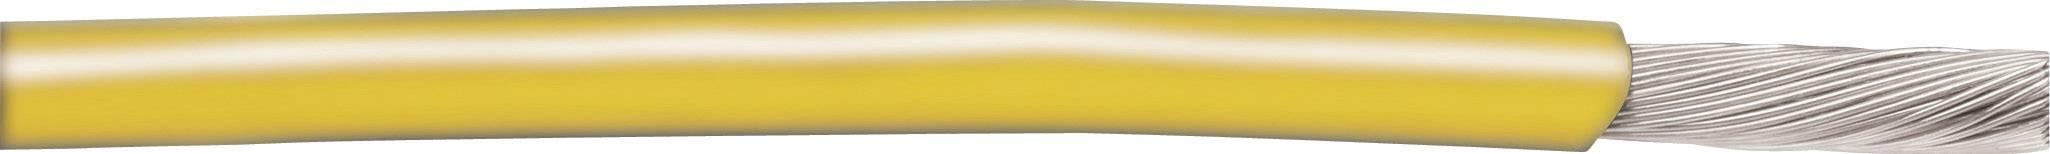 Pletenica EcoWire 1 x 3.31 mm, rumena AlphaWire 6718 30.5 m